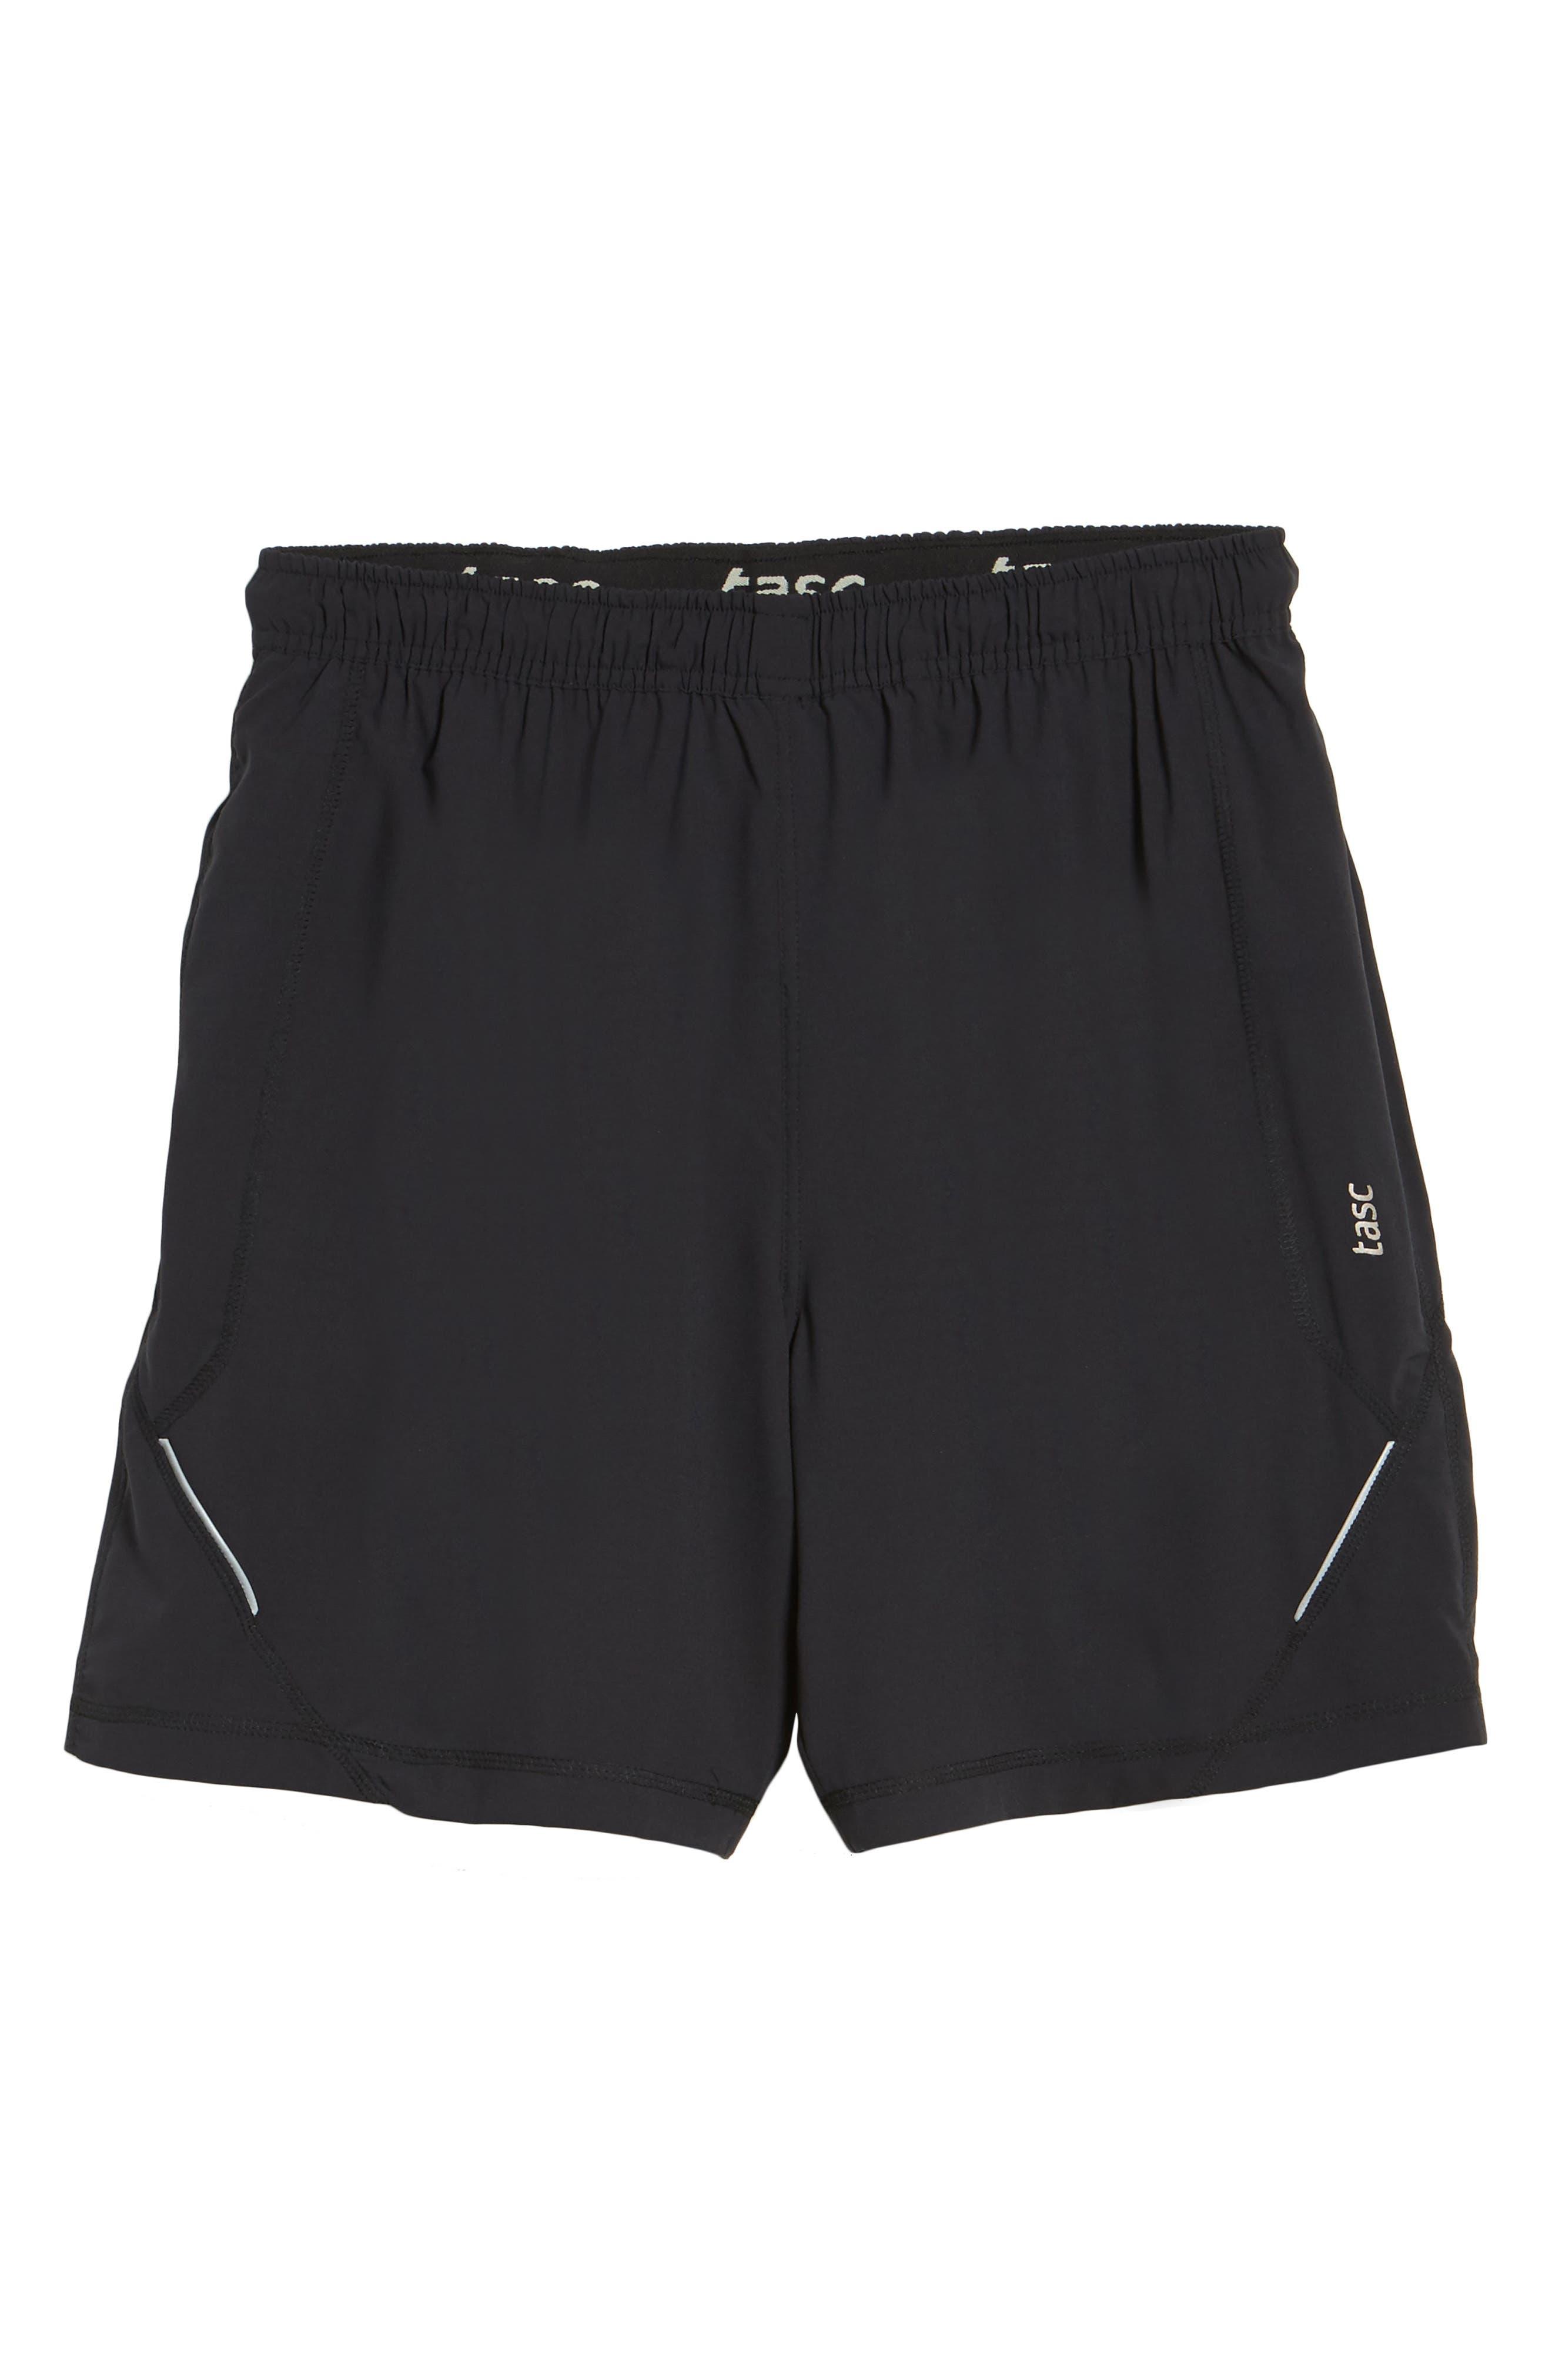 Propulsion Athletic Shorts,                             Alternate thumbnail 6, color,                             BLACK